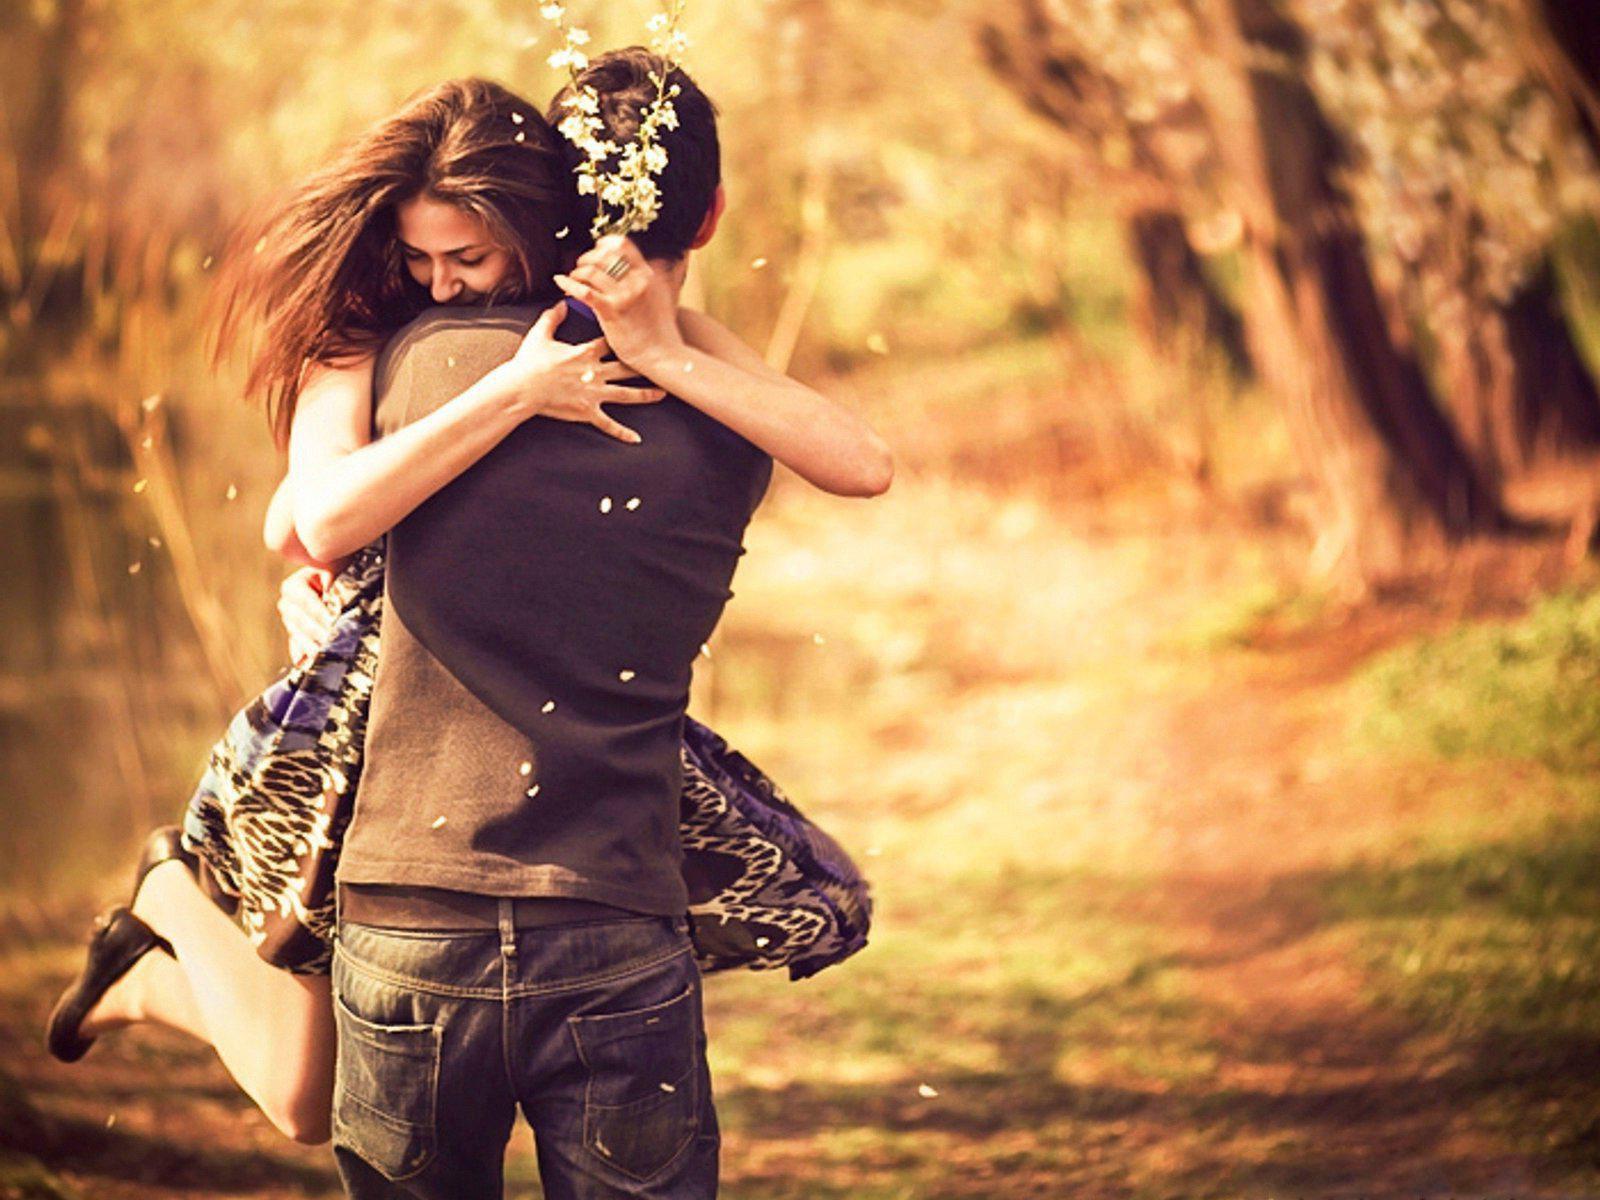 http://2.bp.blogspot.com/-m27xF_x2I4o/UUsI5VqS8rI/AAAAAAAAJXs/4DL8BdRtnjo/s1600/Couple+Enjoying+There+Love+HD+Wallpaper-1600x1200-bestlovehdwallpapers.blogspot.com.jpg